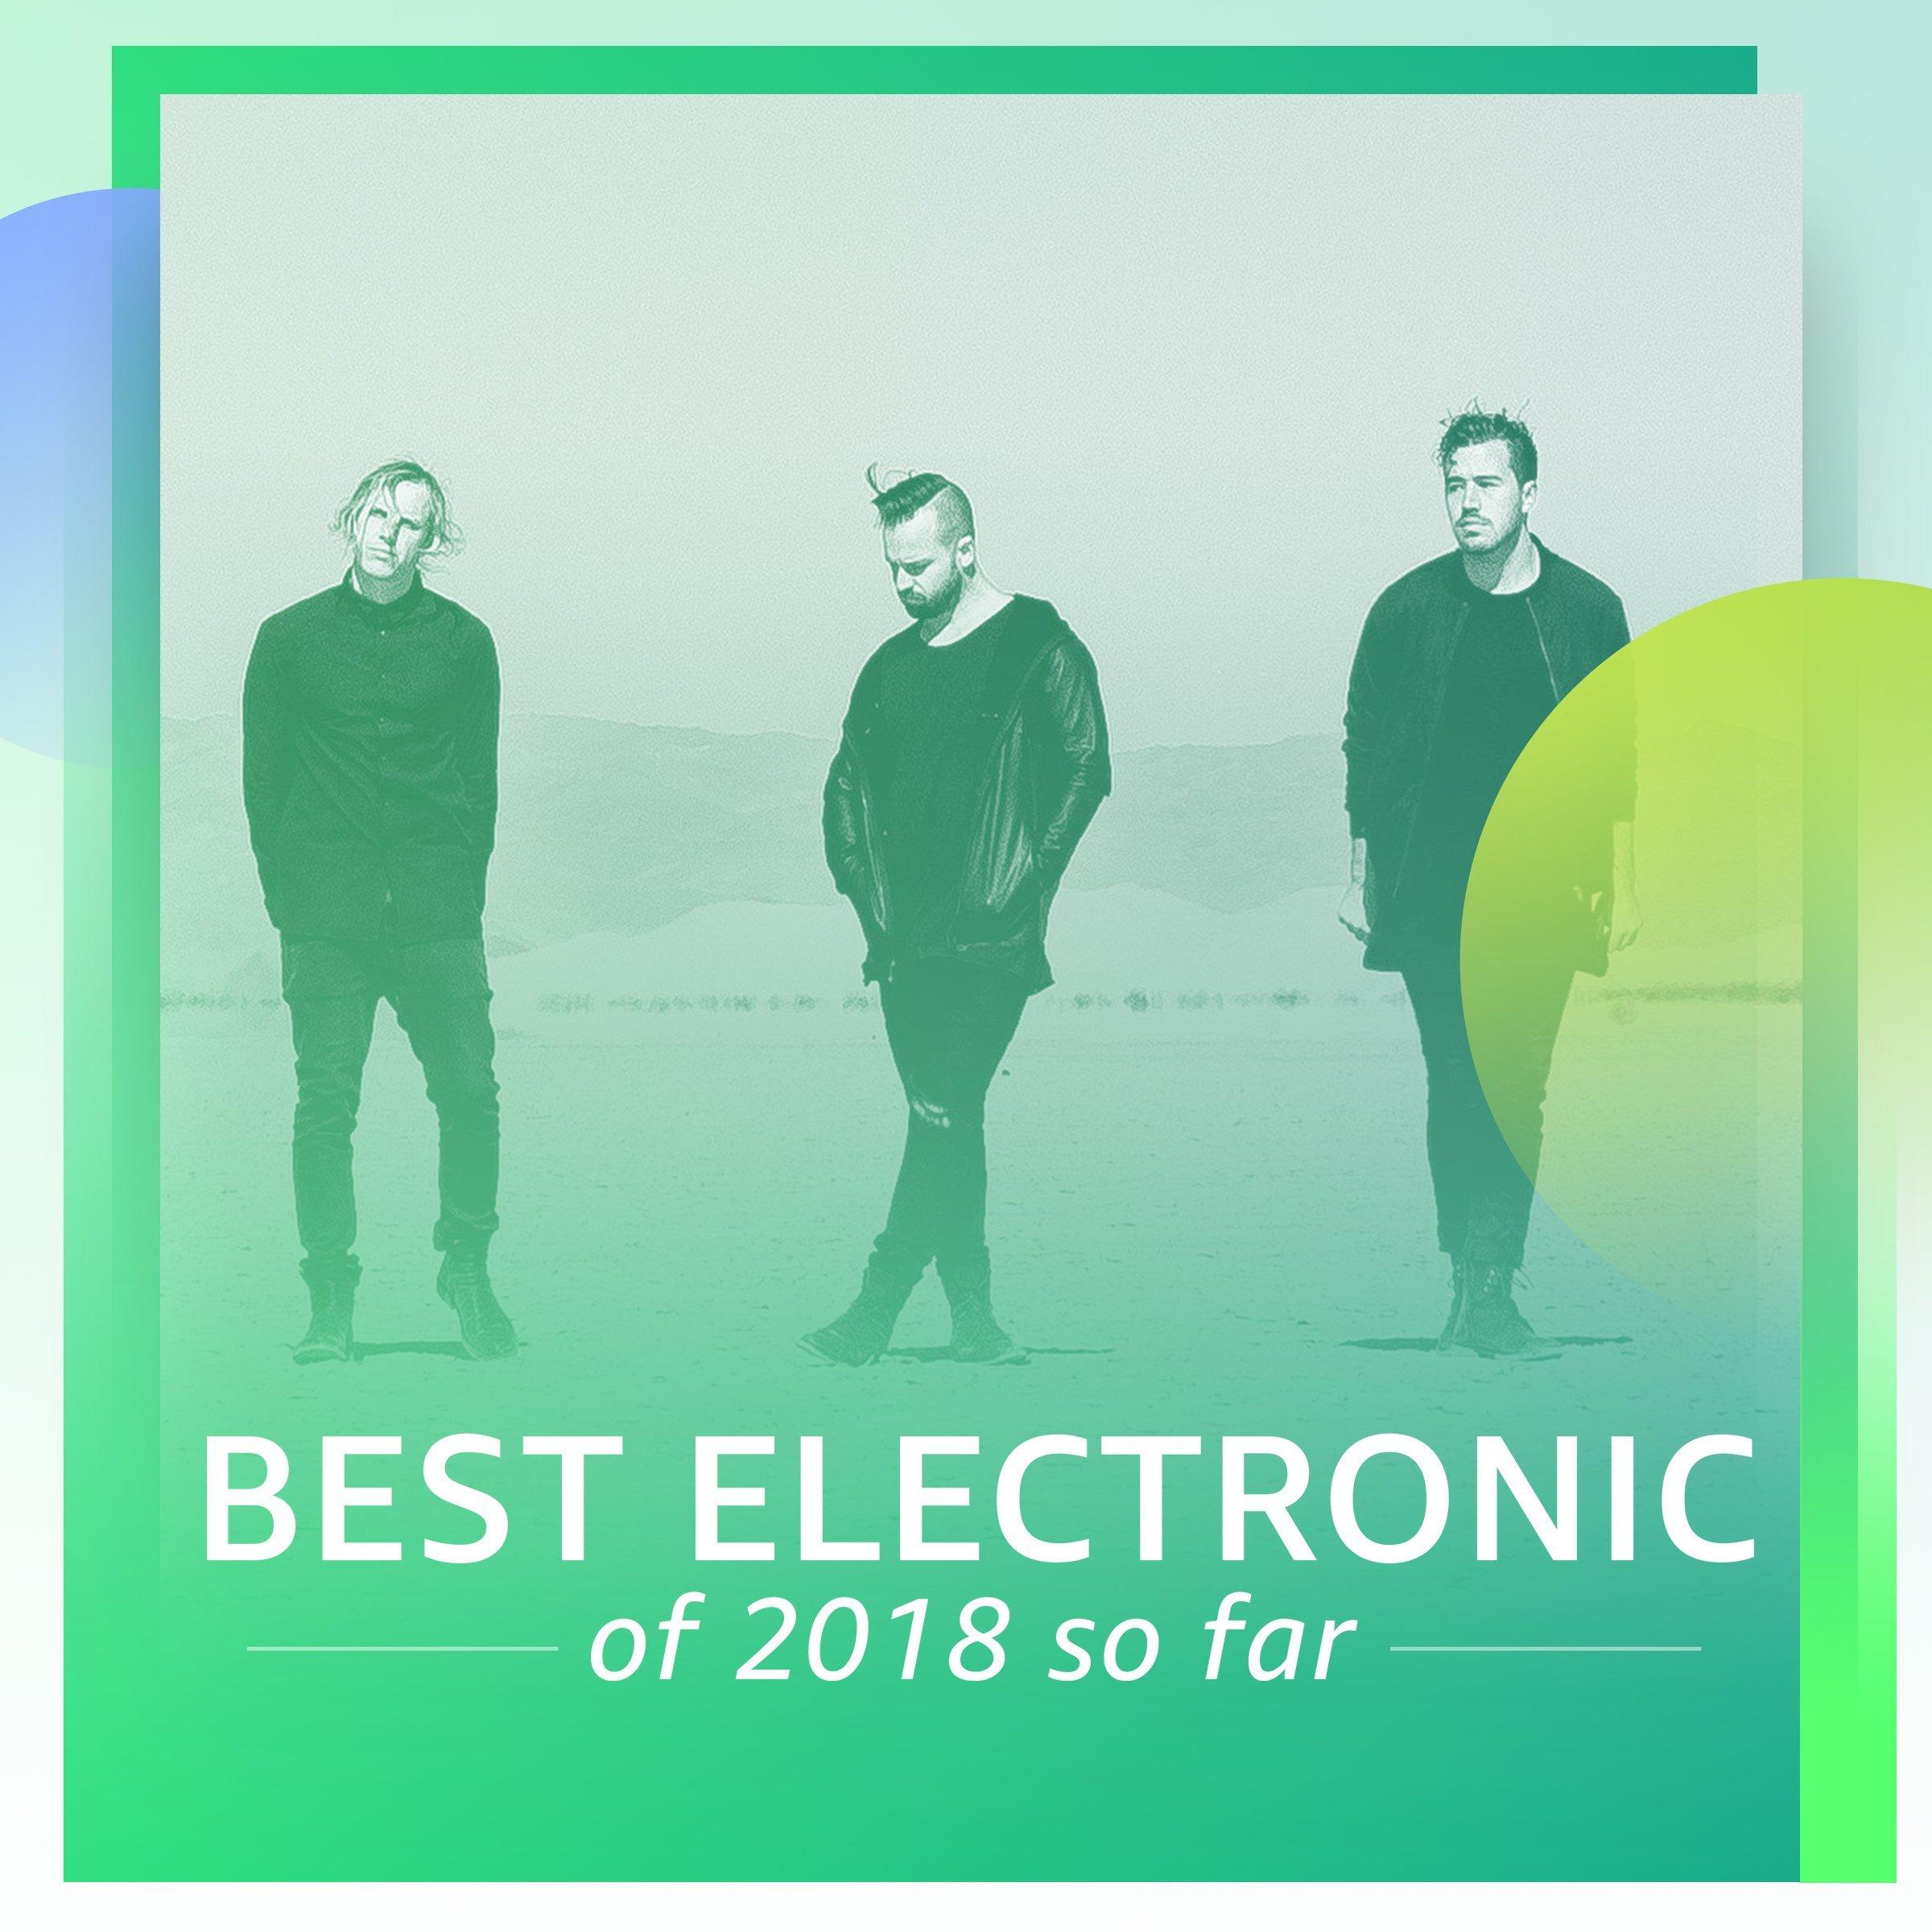 Best Electronic of 2018 So Far